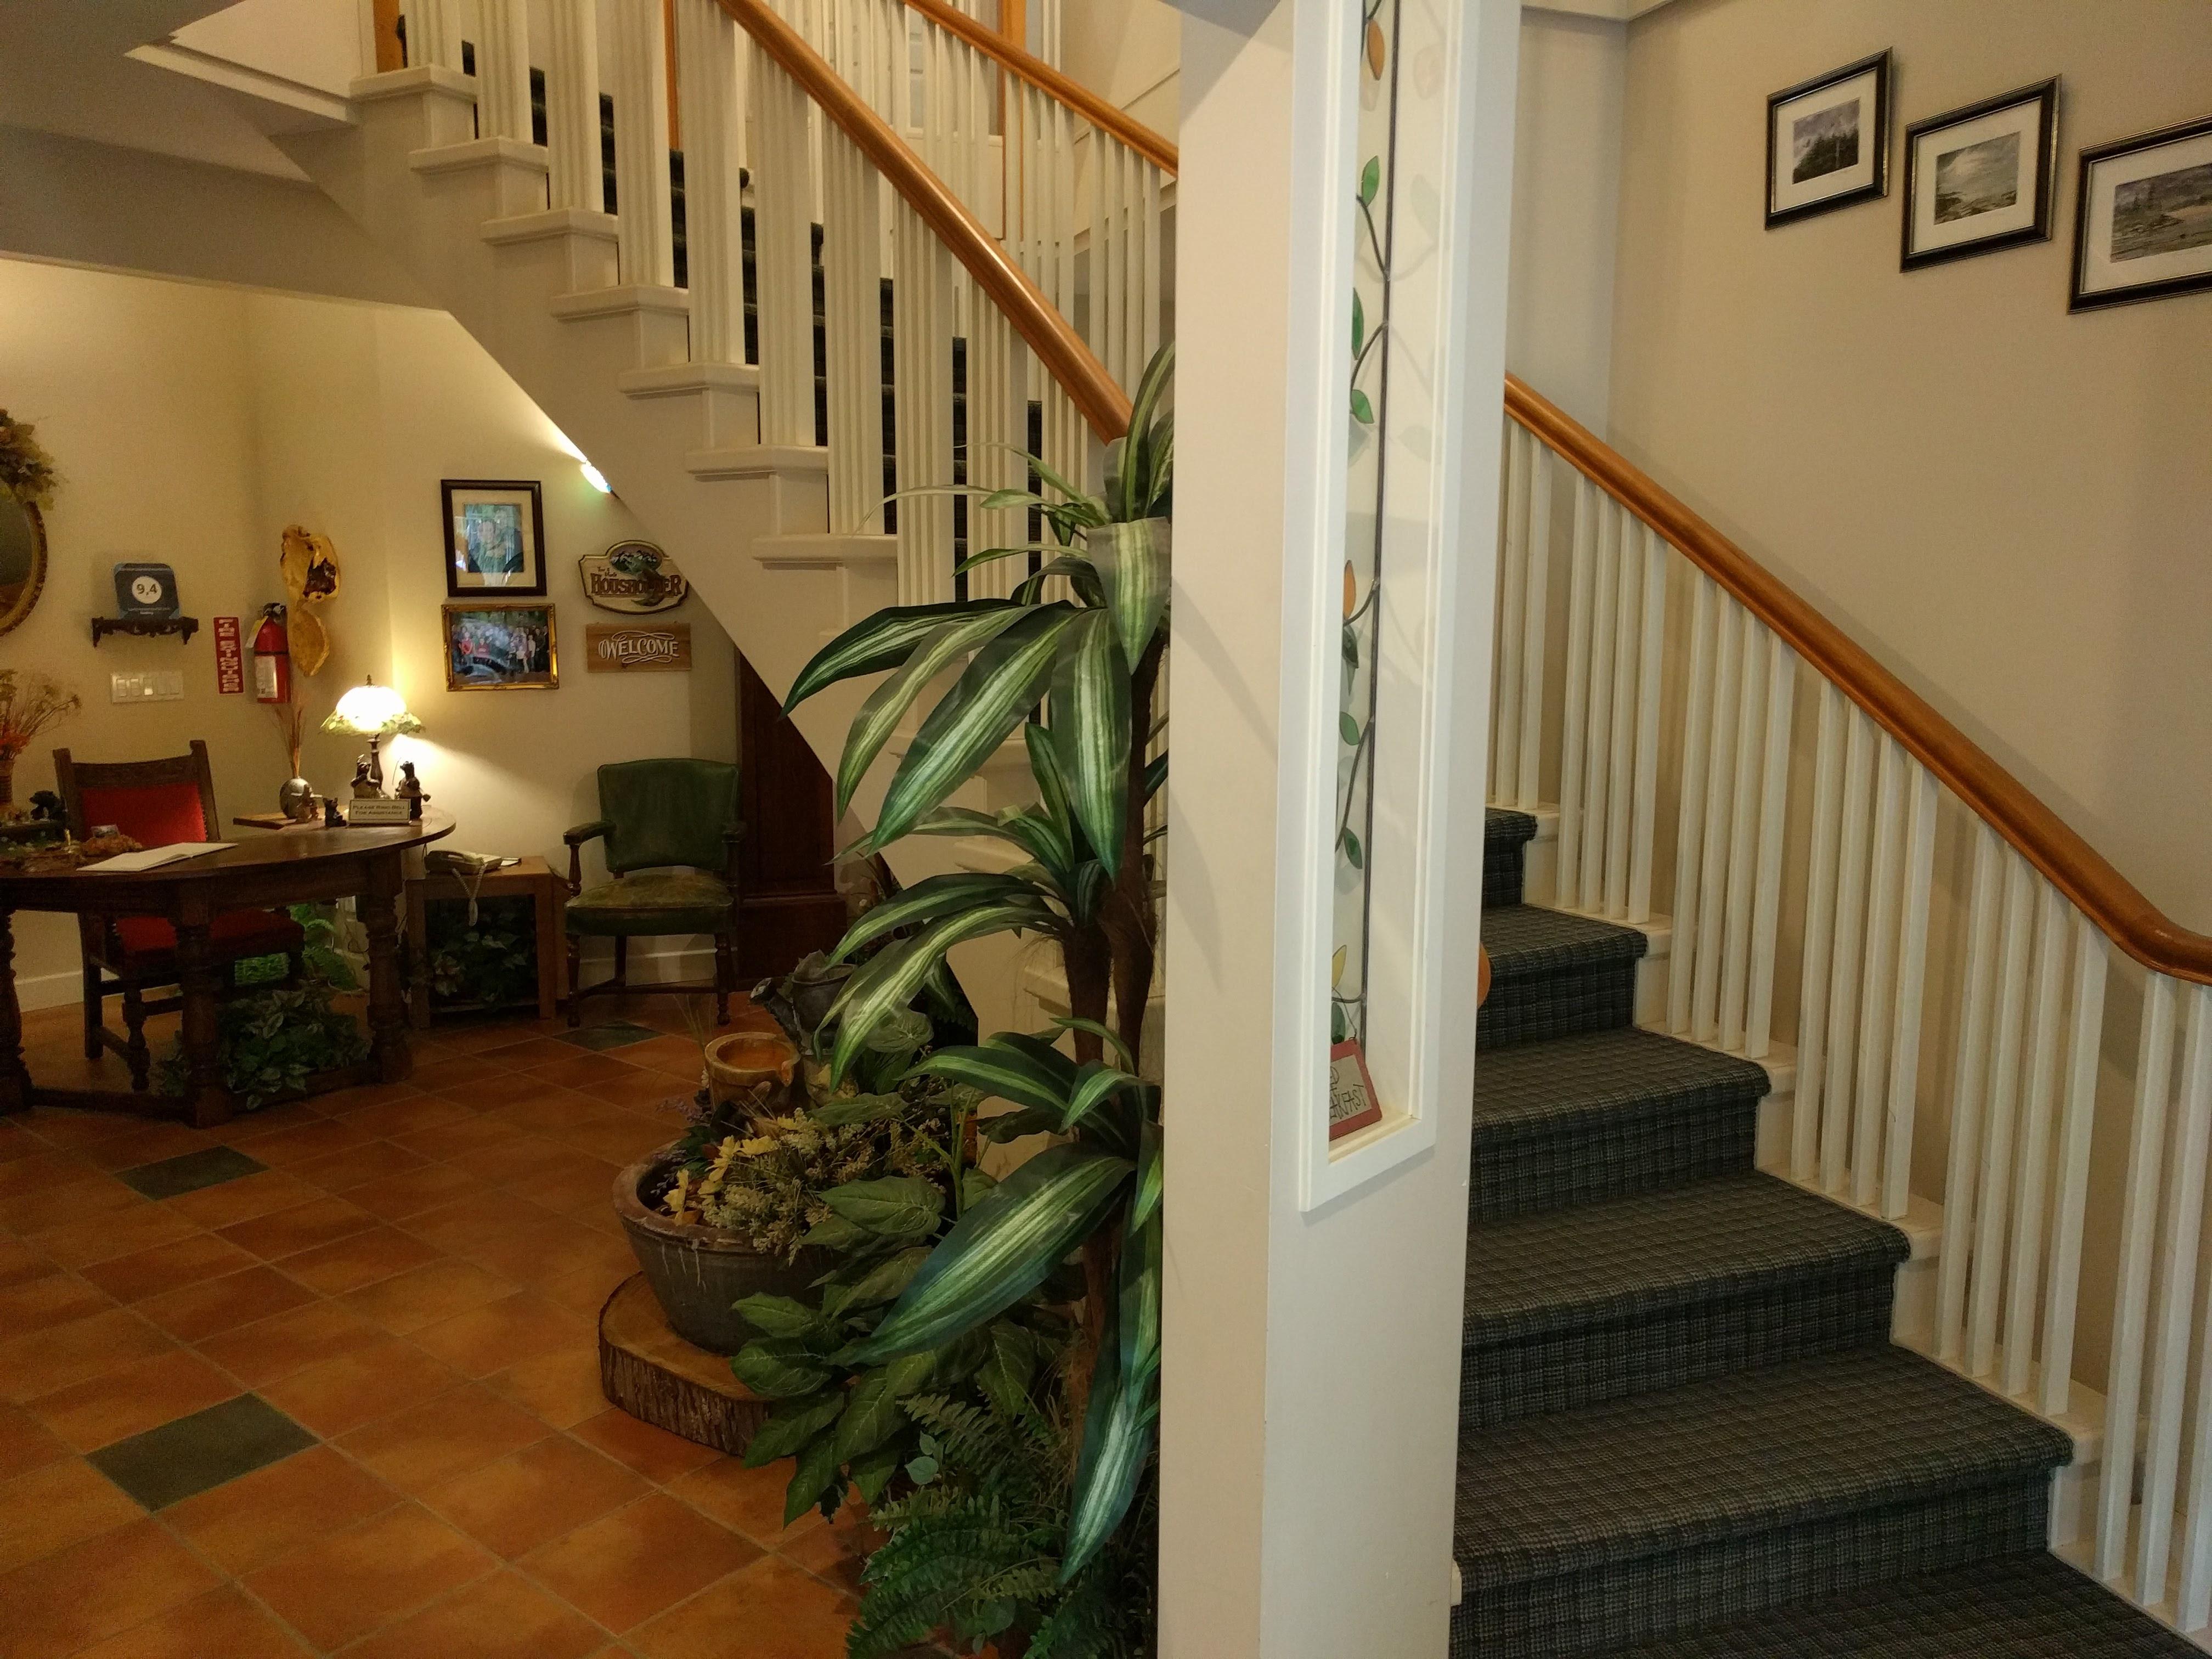 Cedar Wood Lodge Amenities Cedarwood Lodge Bed And Breakfast Inn